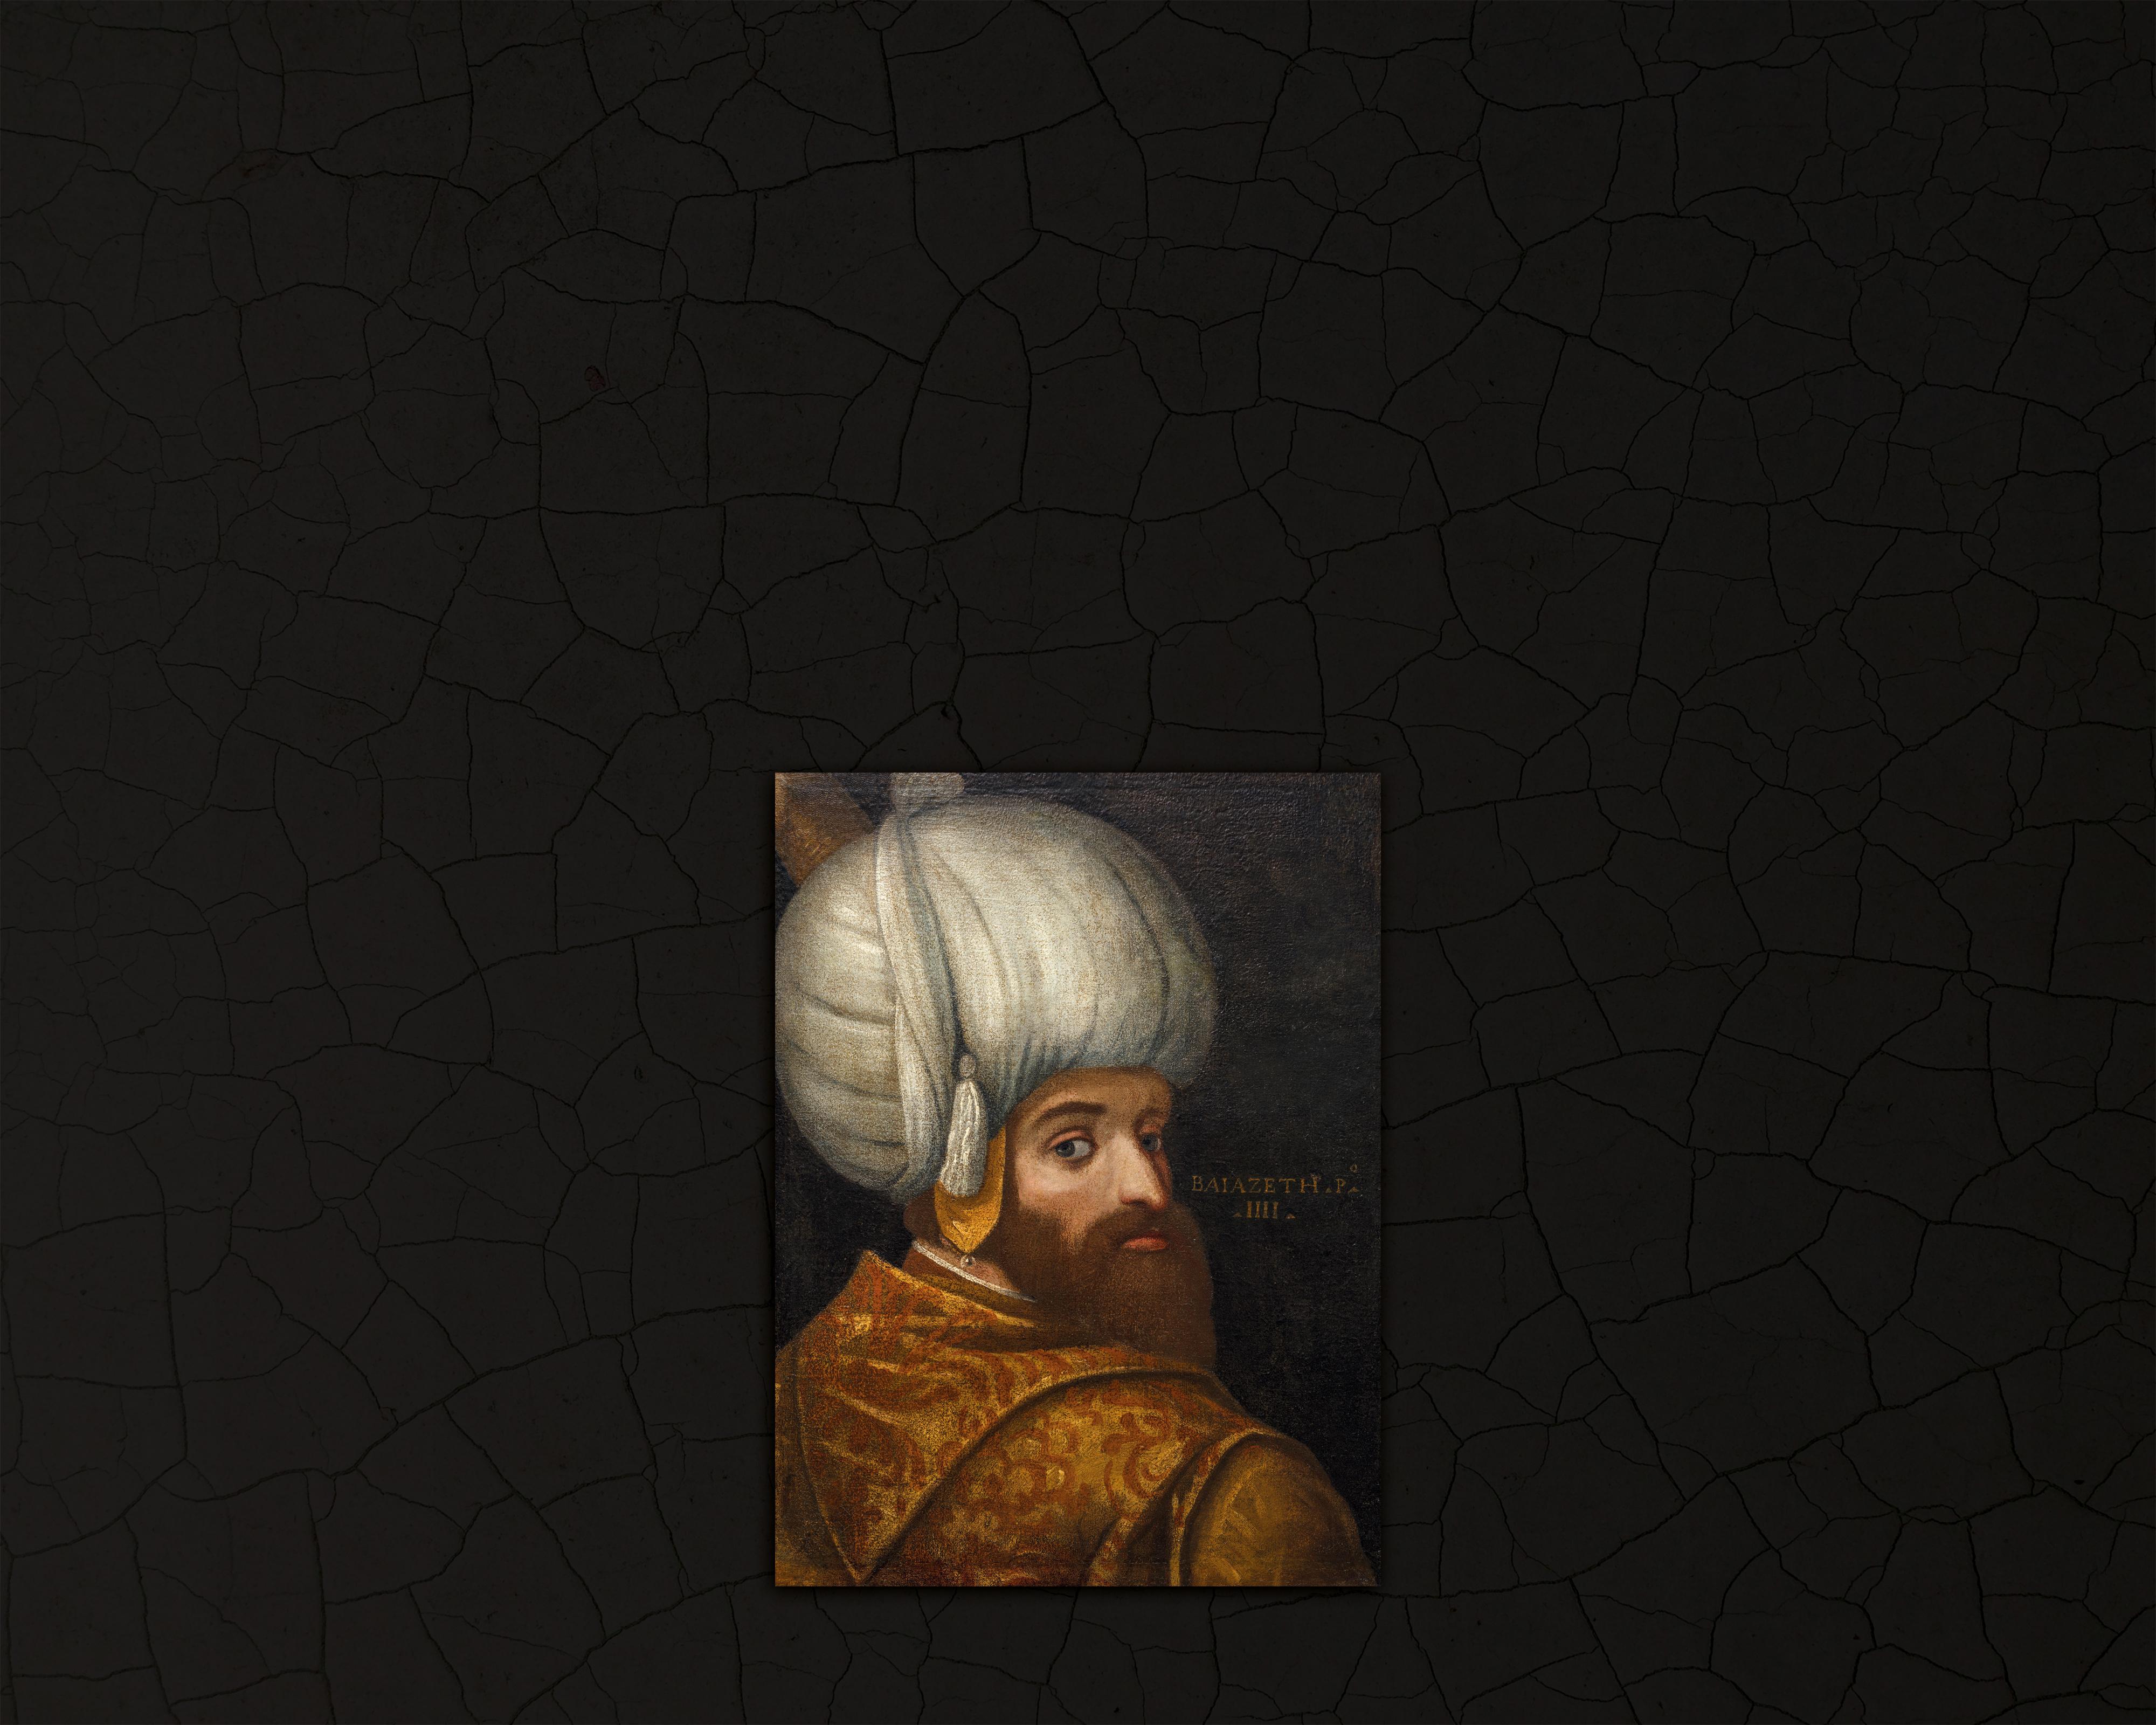 The blurred history of Orientalist art